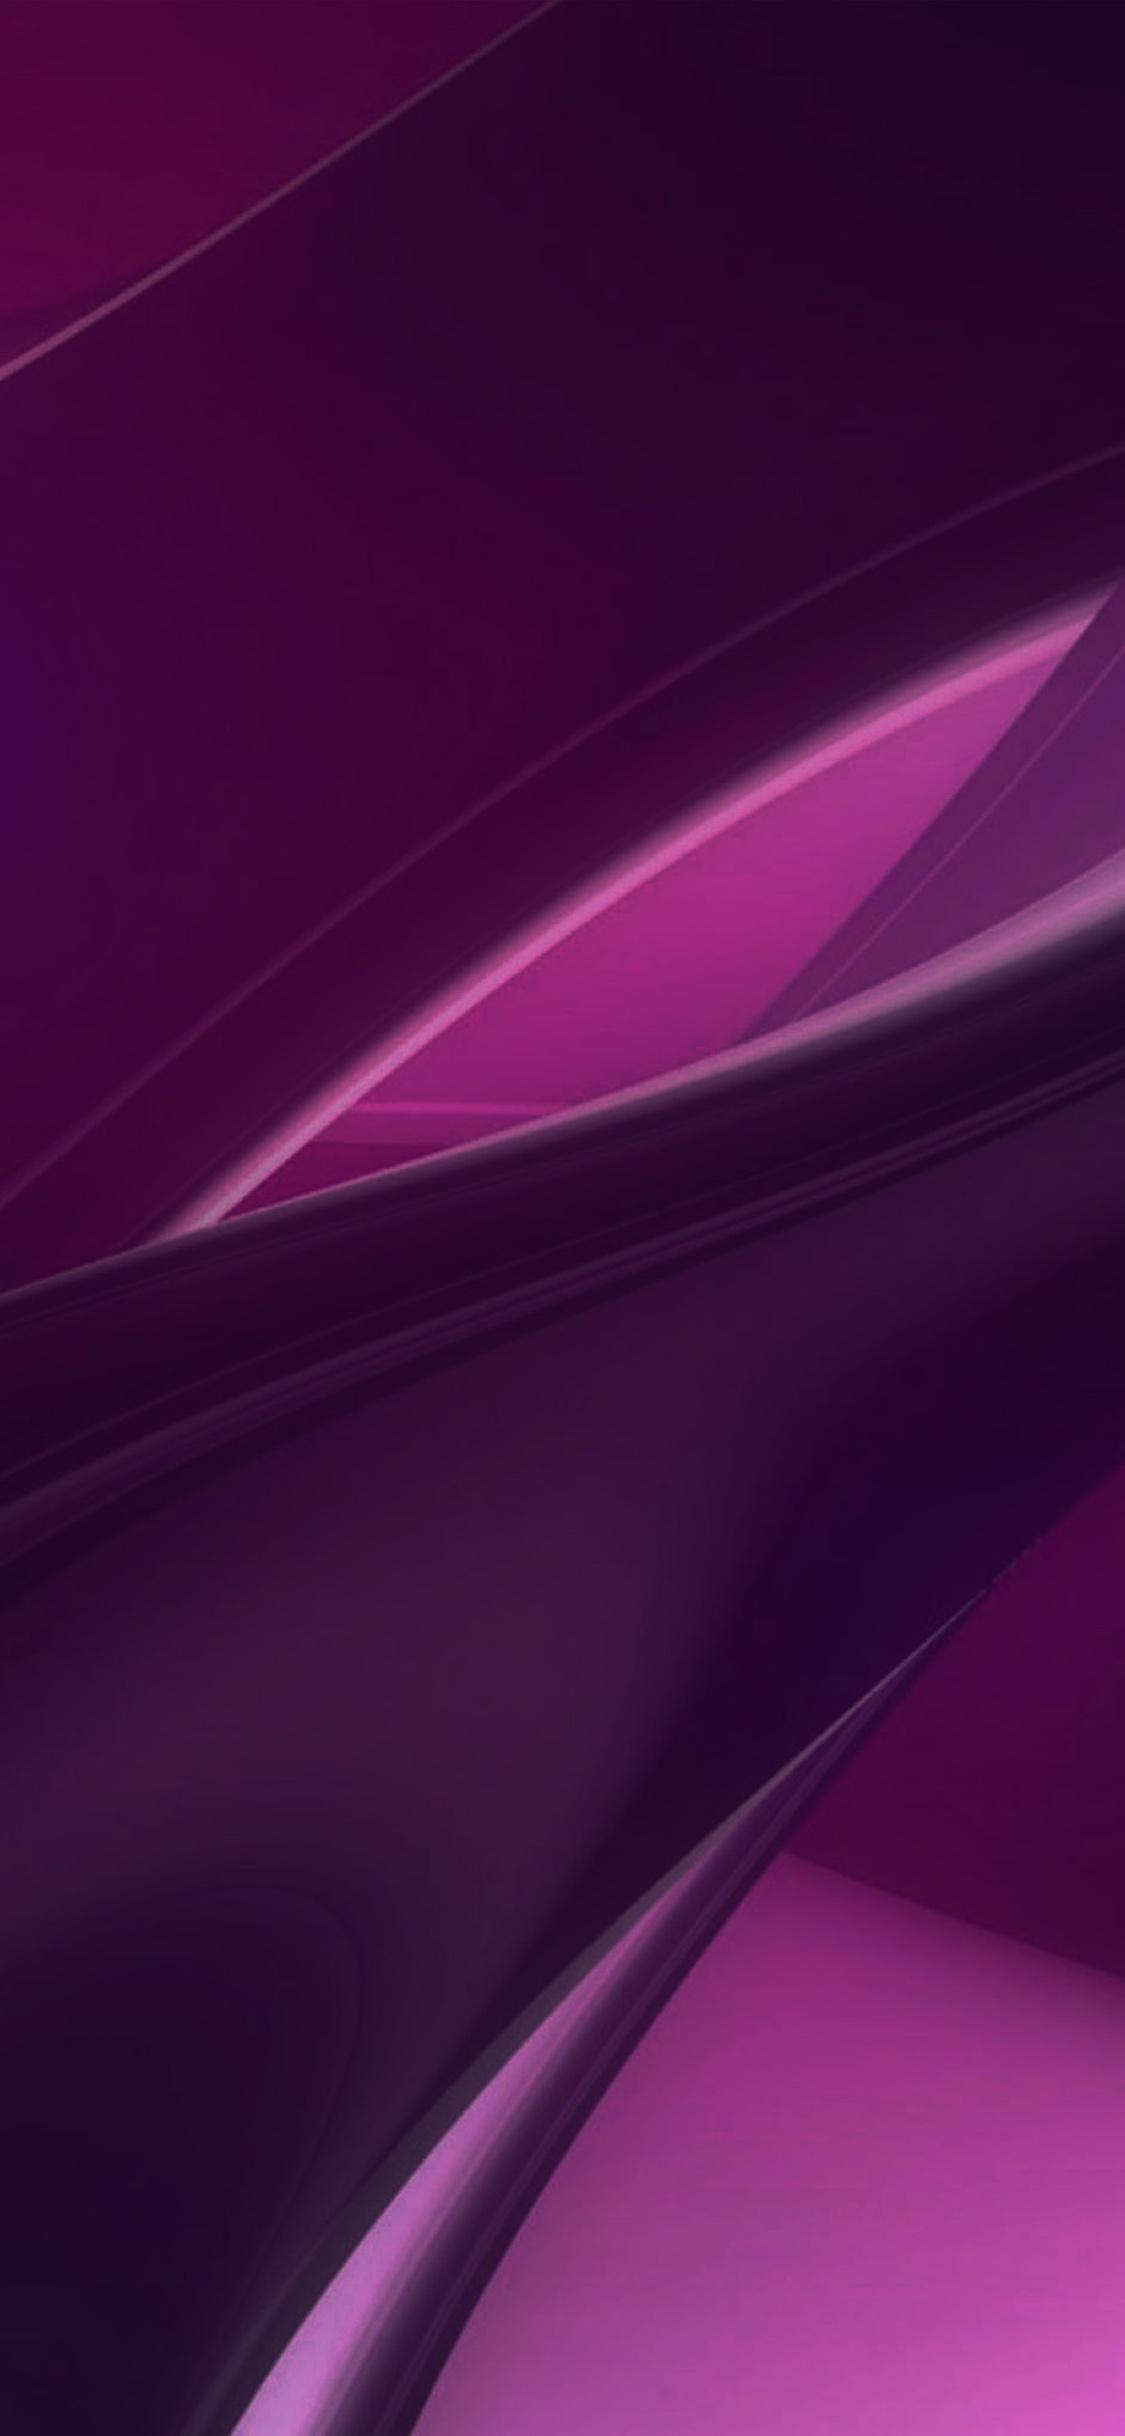 Iphonexpapers Com Iphone X Wallpaper Vm63 Inside Body Purple Pattern